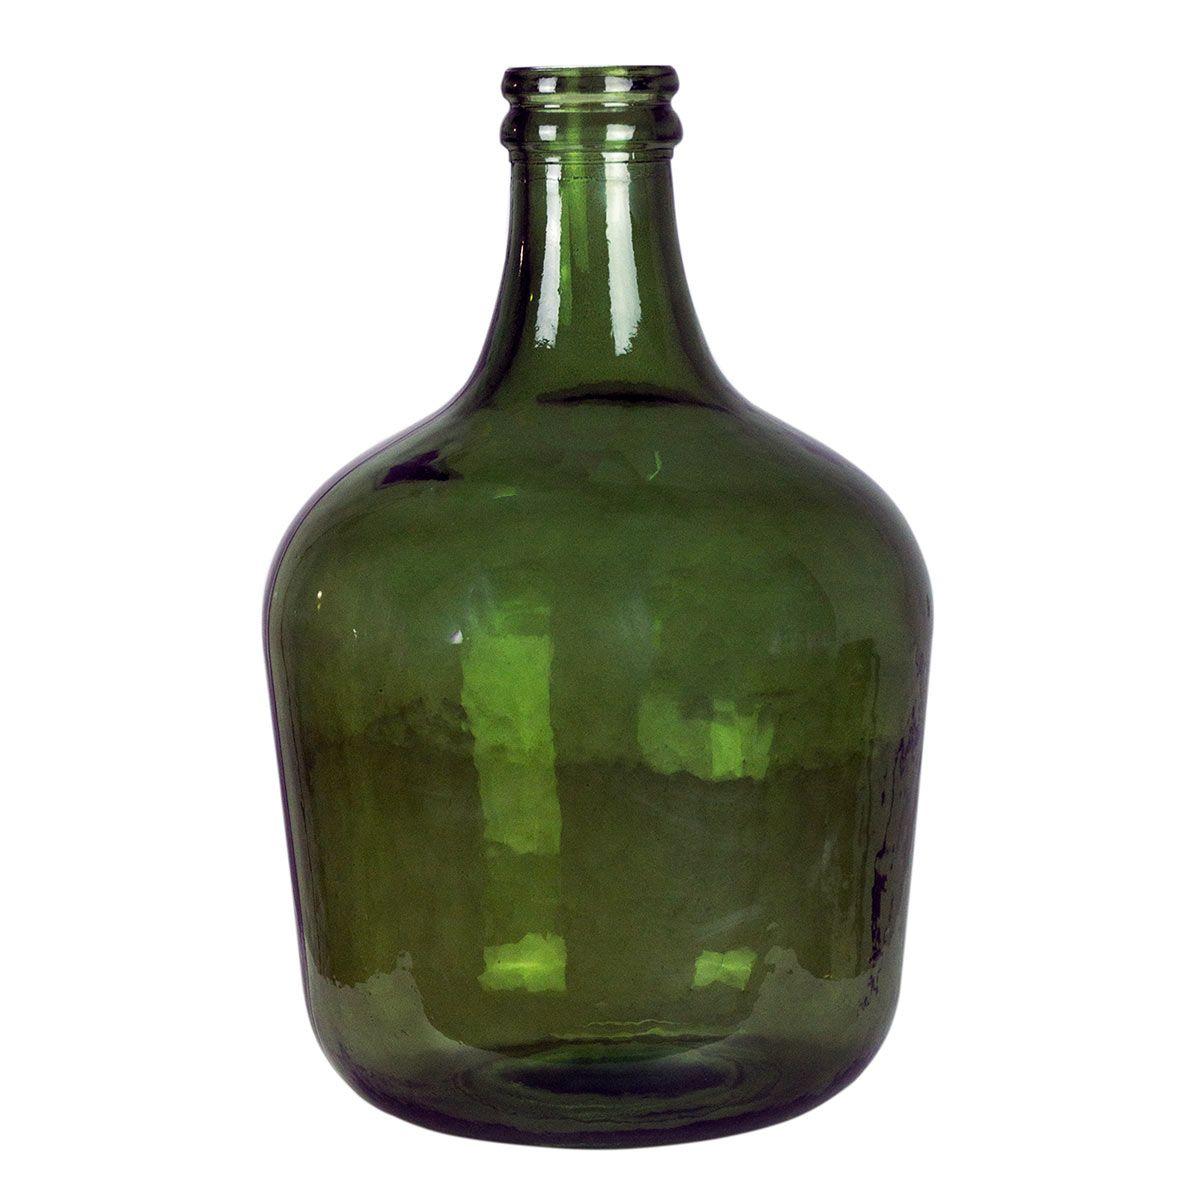 Bonbonne dame jeanne 12L vert